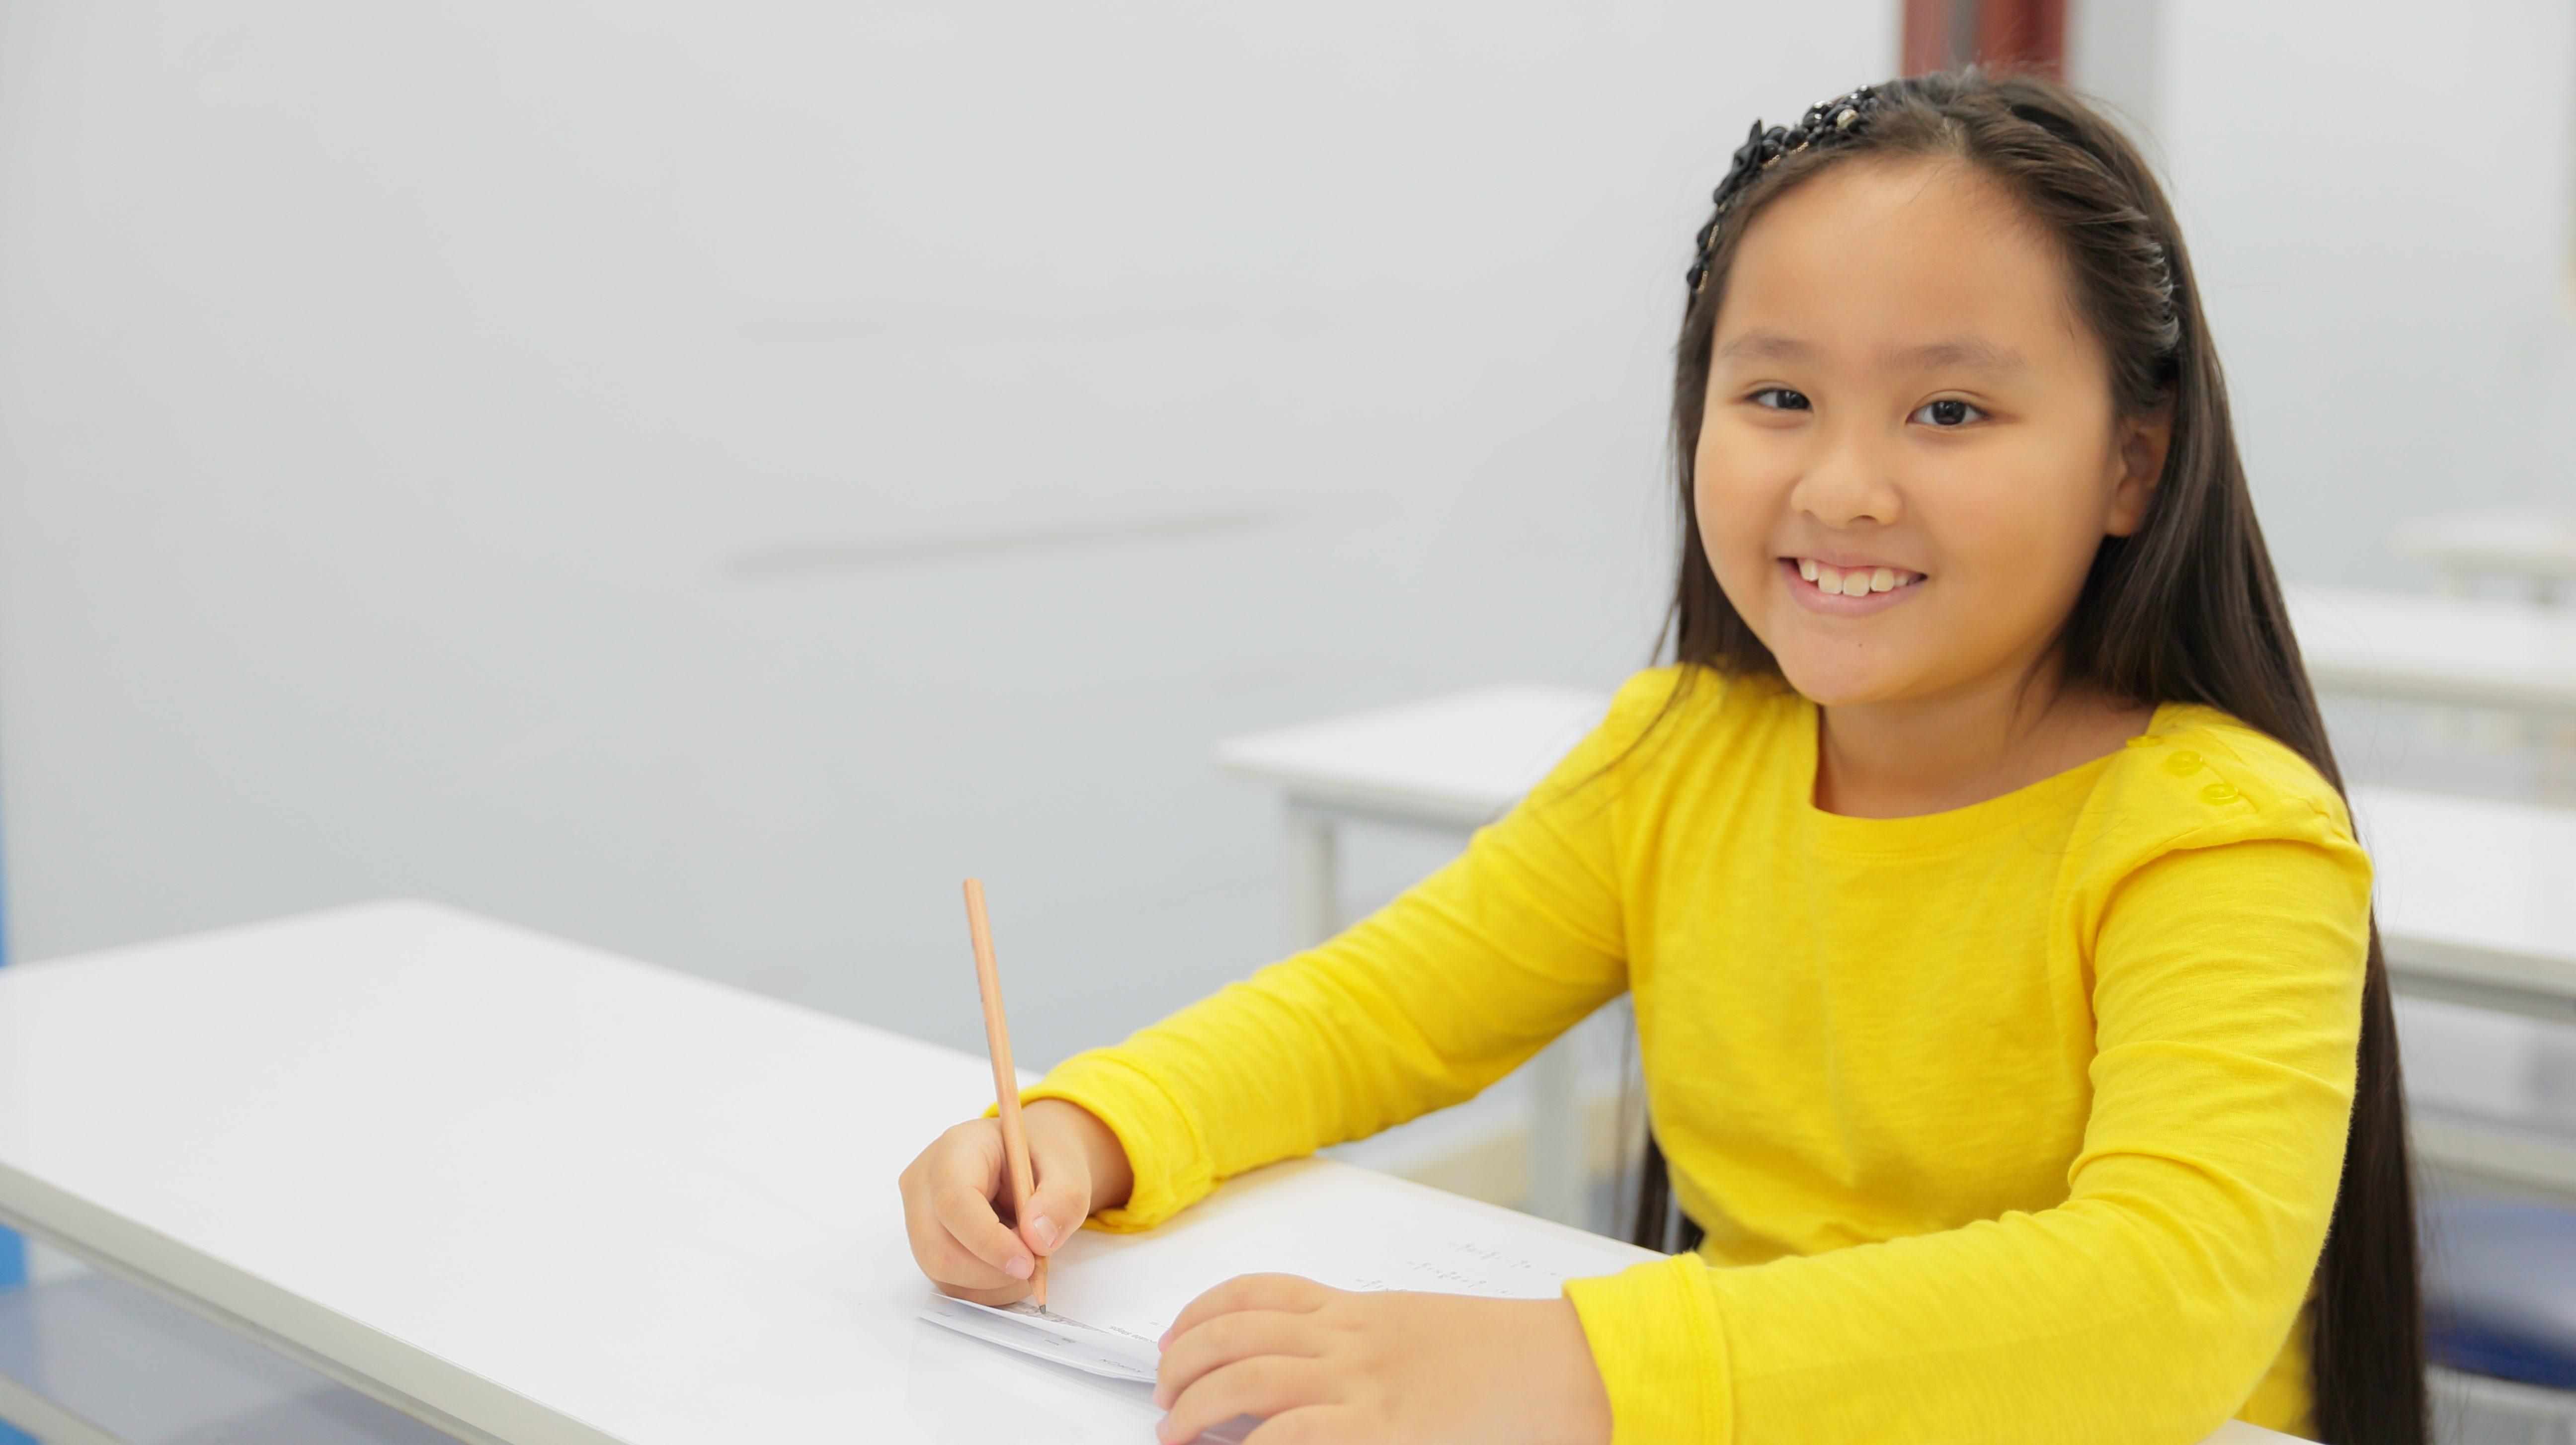 Dealing with Pressure in School